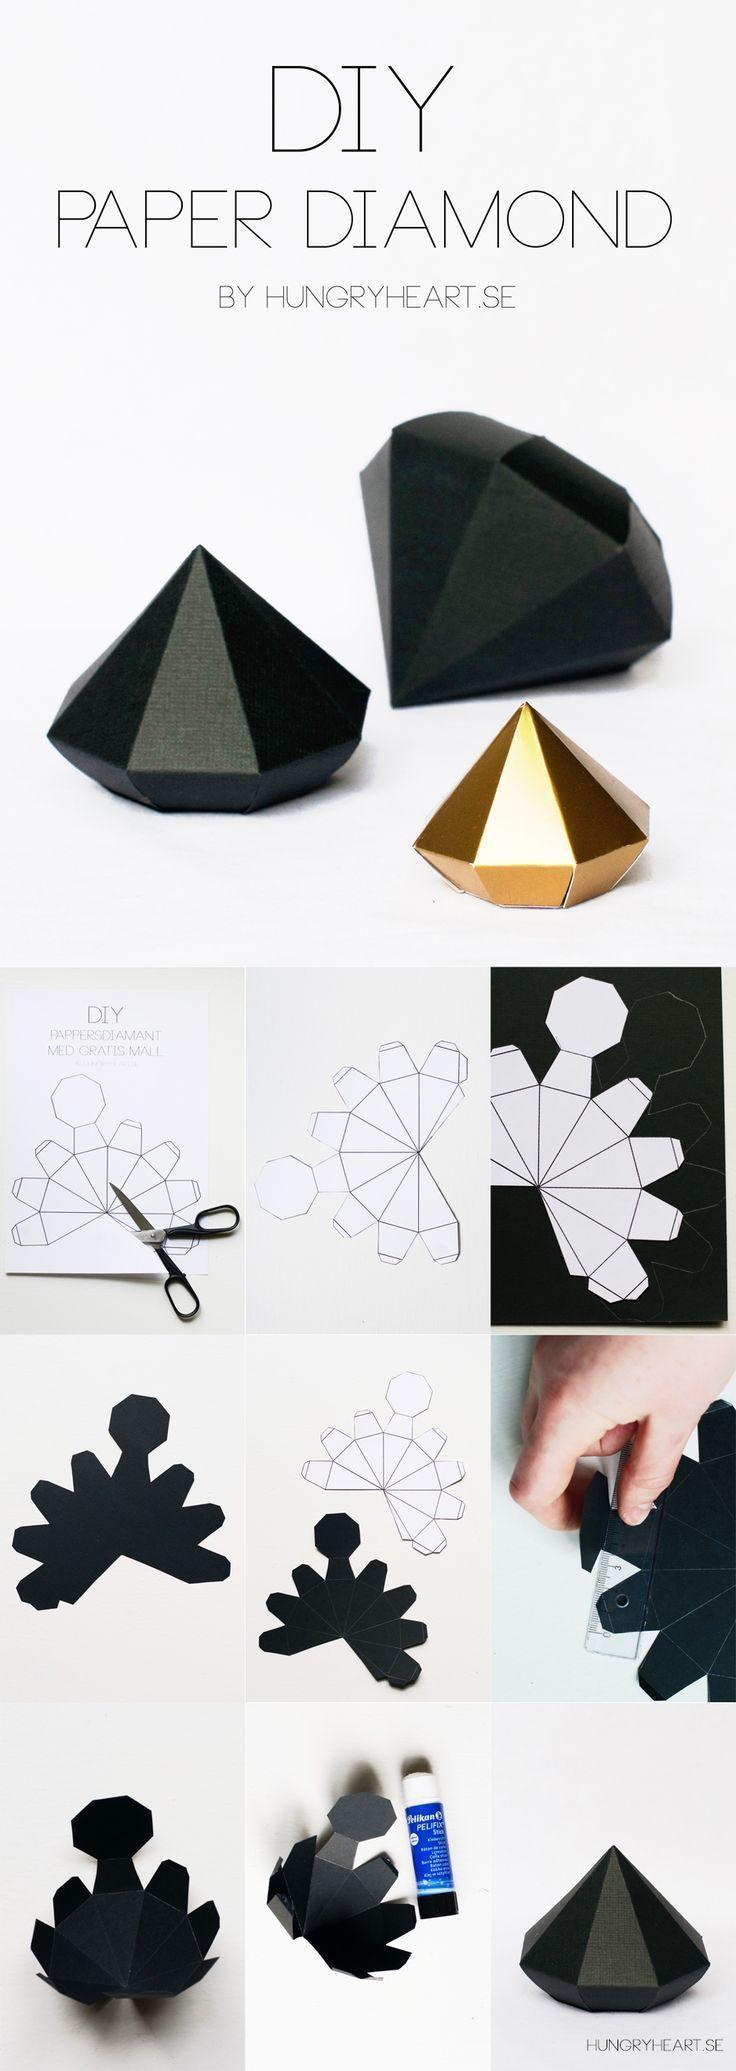 DIY Paper Diamond Tutorial with FREE Printable Template | HungryHeart.se